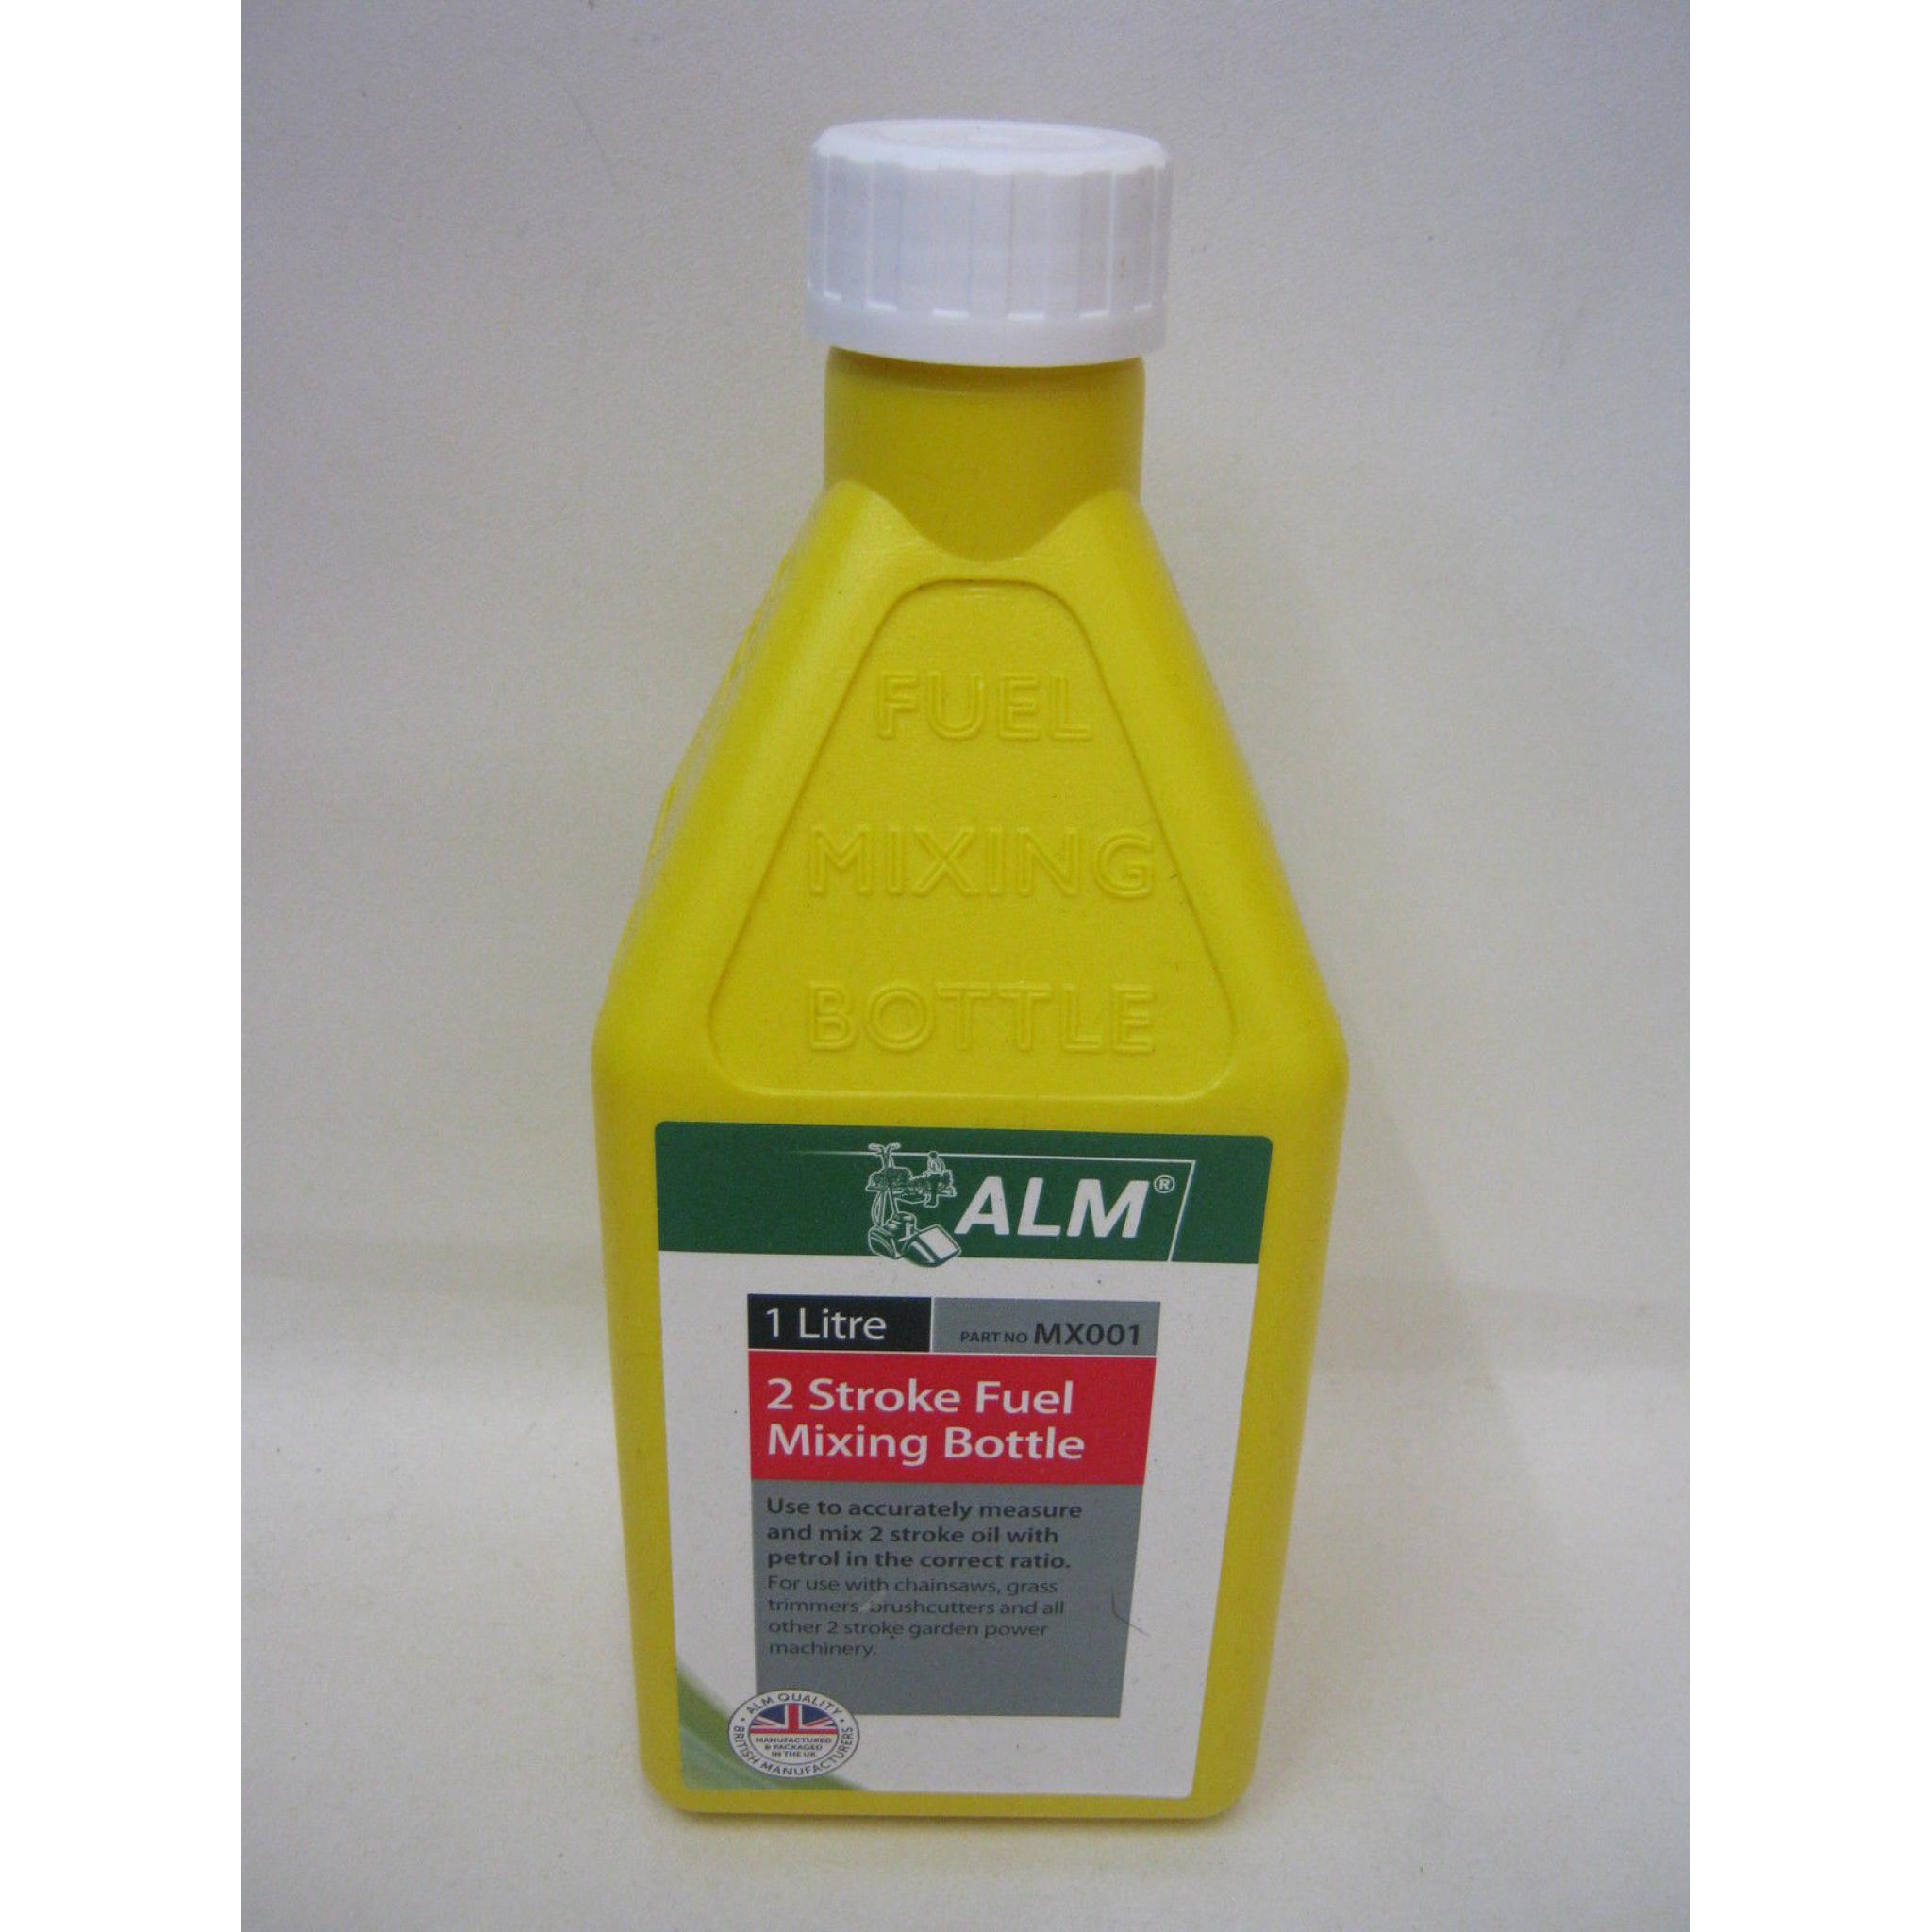 New Alm 2 Stroke Fuel Petrol Mixing Bottle Plastic 1 Ltr MX001 Yellow